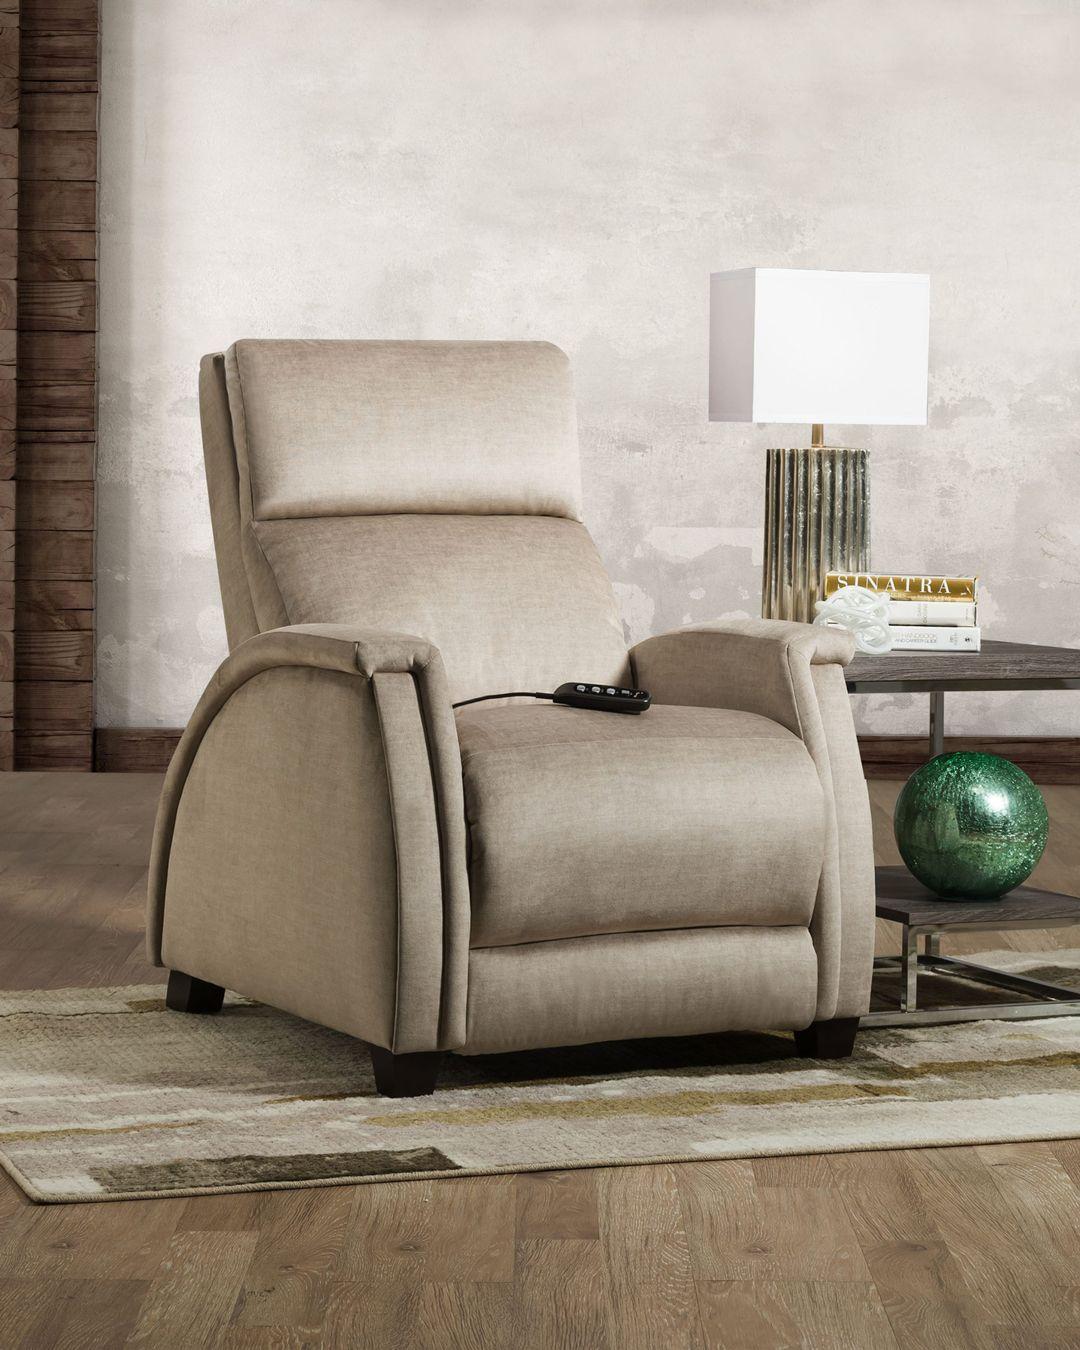 Southern Motion Living Room Legacy Platinum Socozi Zero Gravity Recliner Ure Legacyplatinum Southern Motion Recliner Furniture